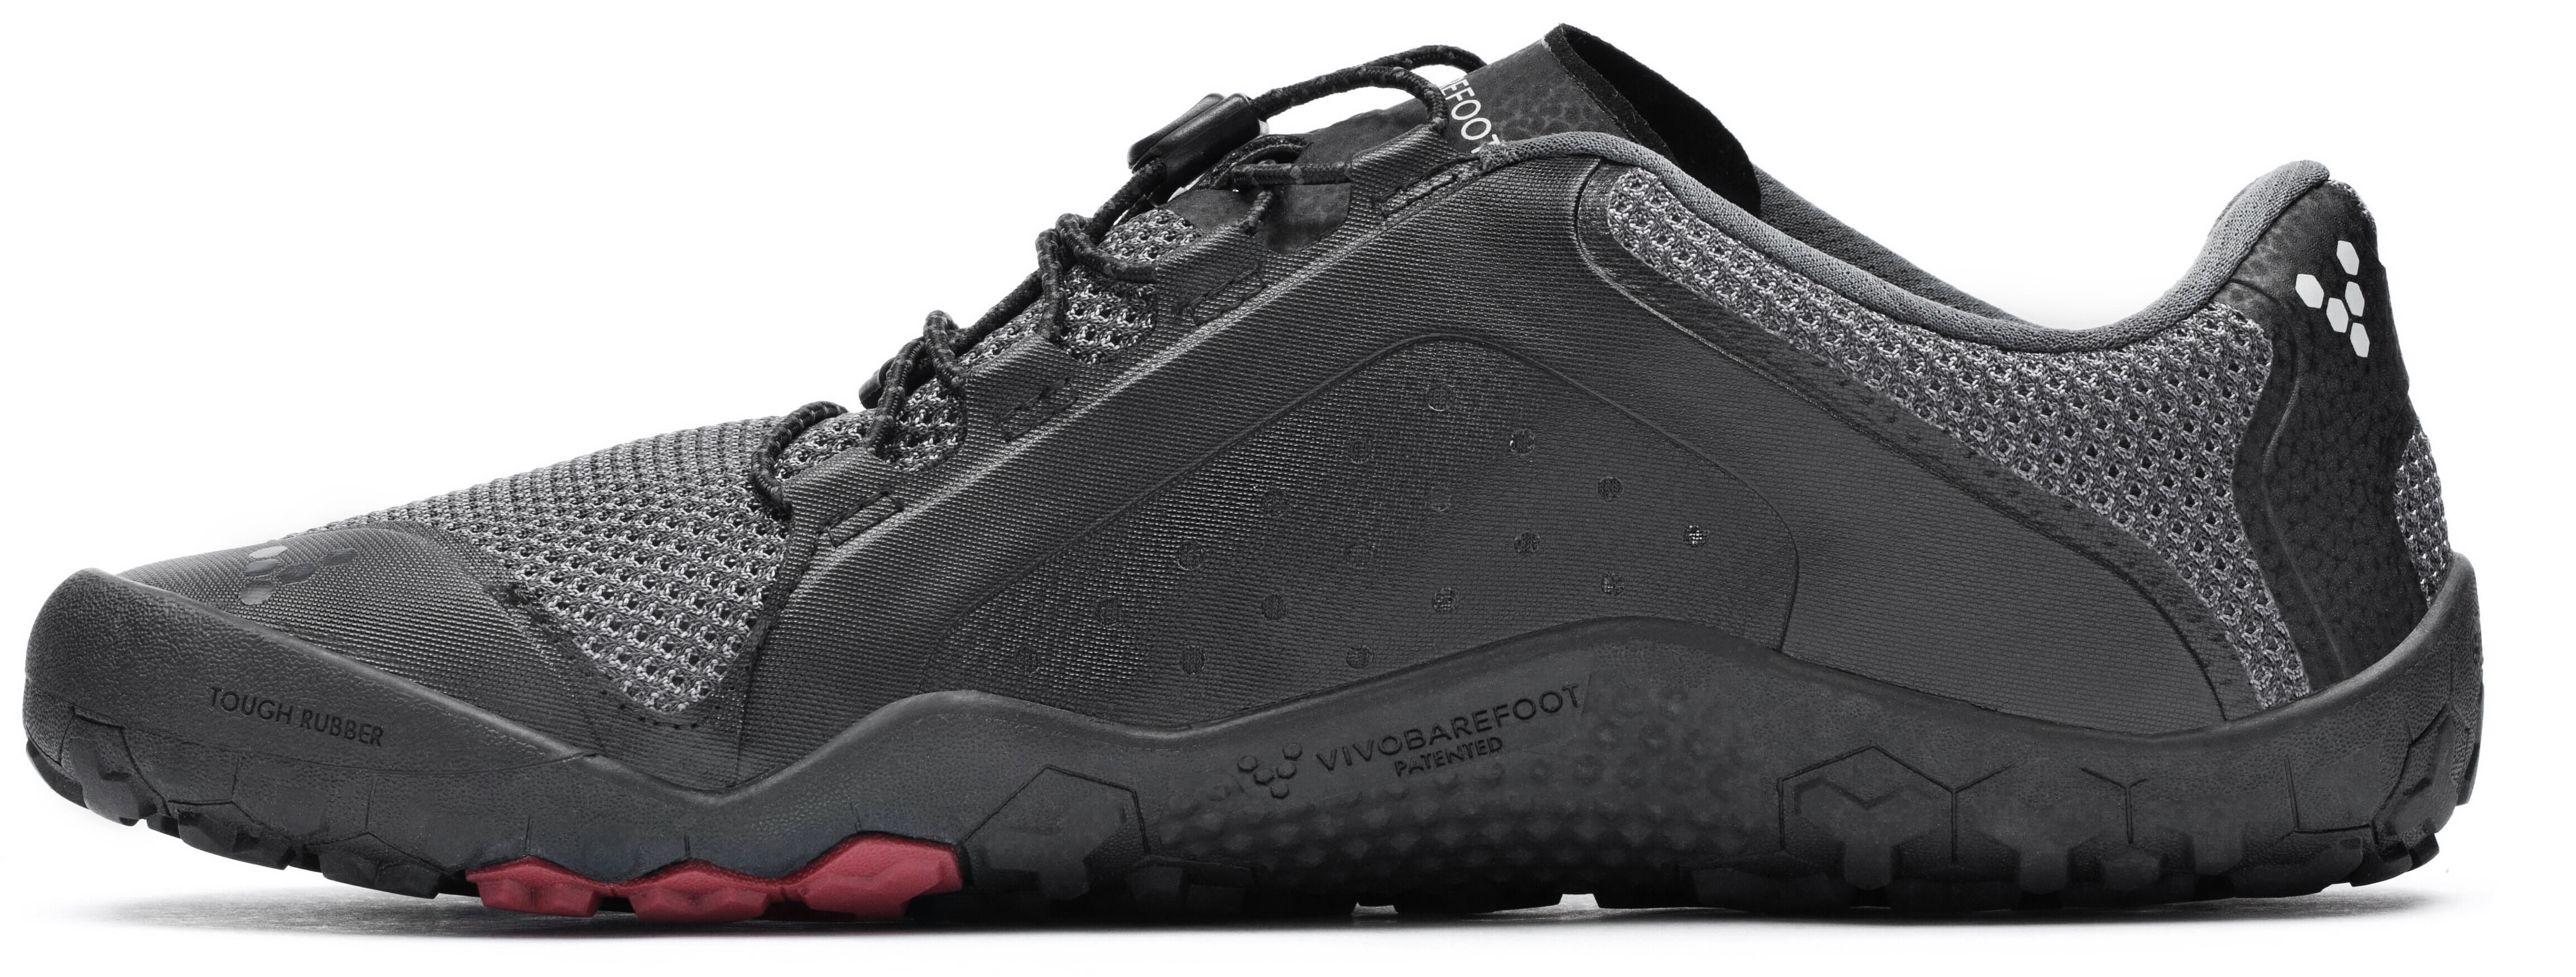 Vivo Trail Running Shoes